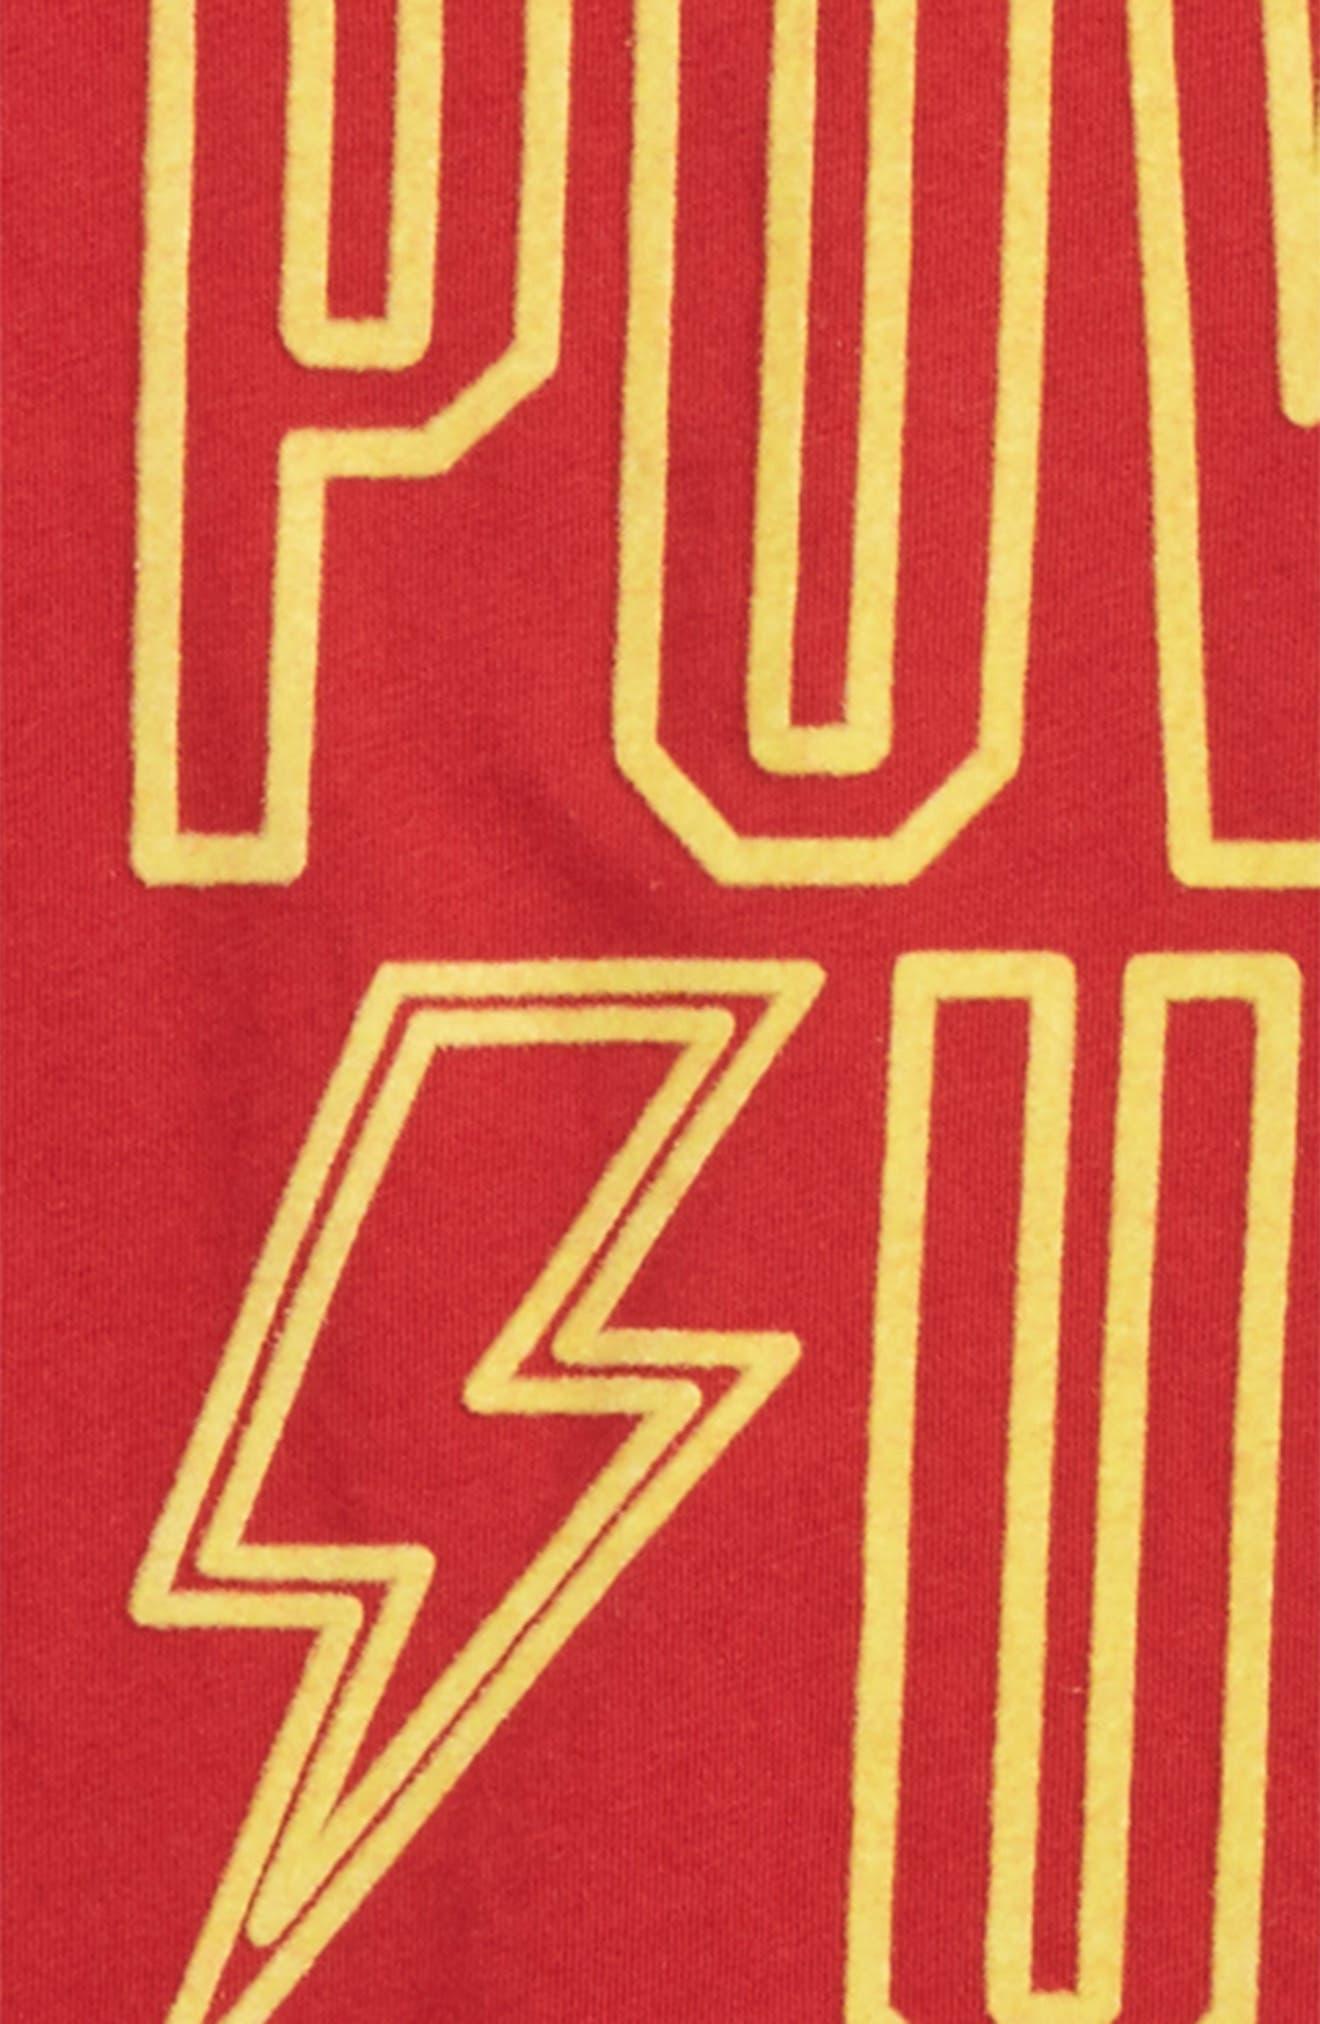 Alternate Image 2  - Peek Power Up T-Shirt (Toddler Boys, Little Boys & Big Boys)